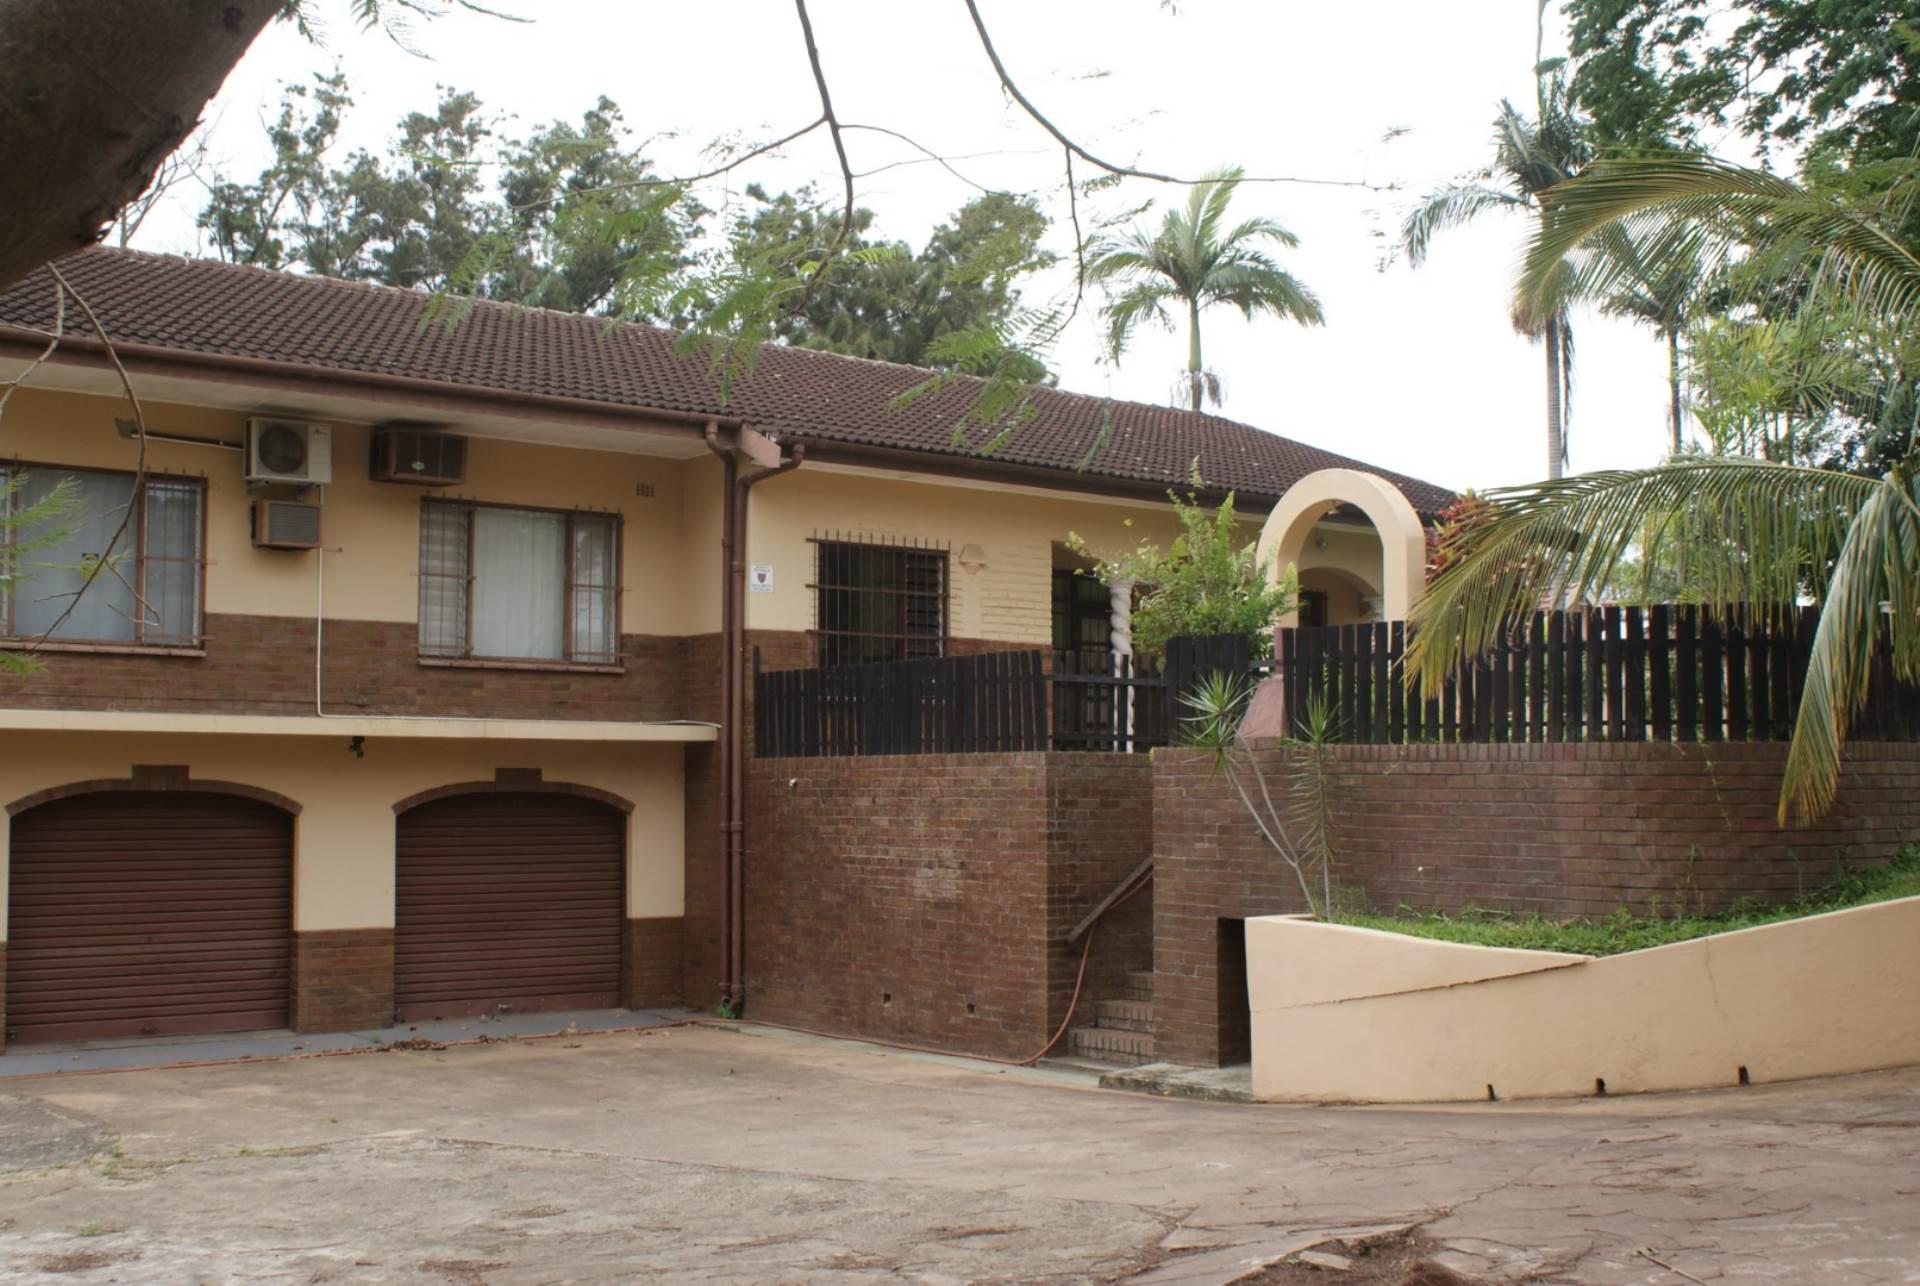 5 BedroomHouse For Sale In Mtubatuba